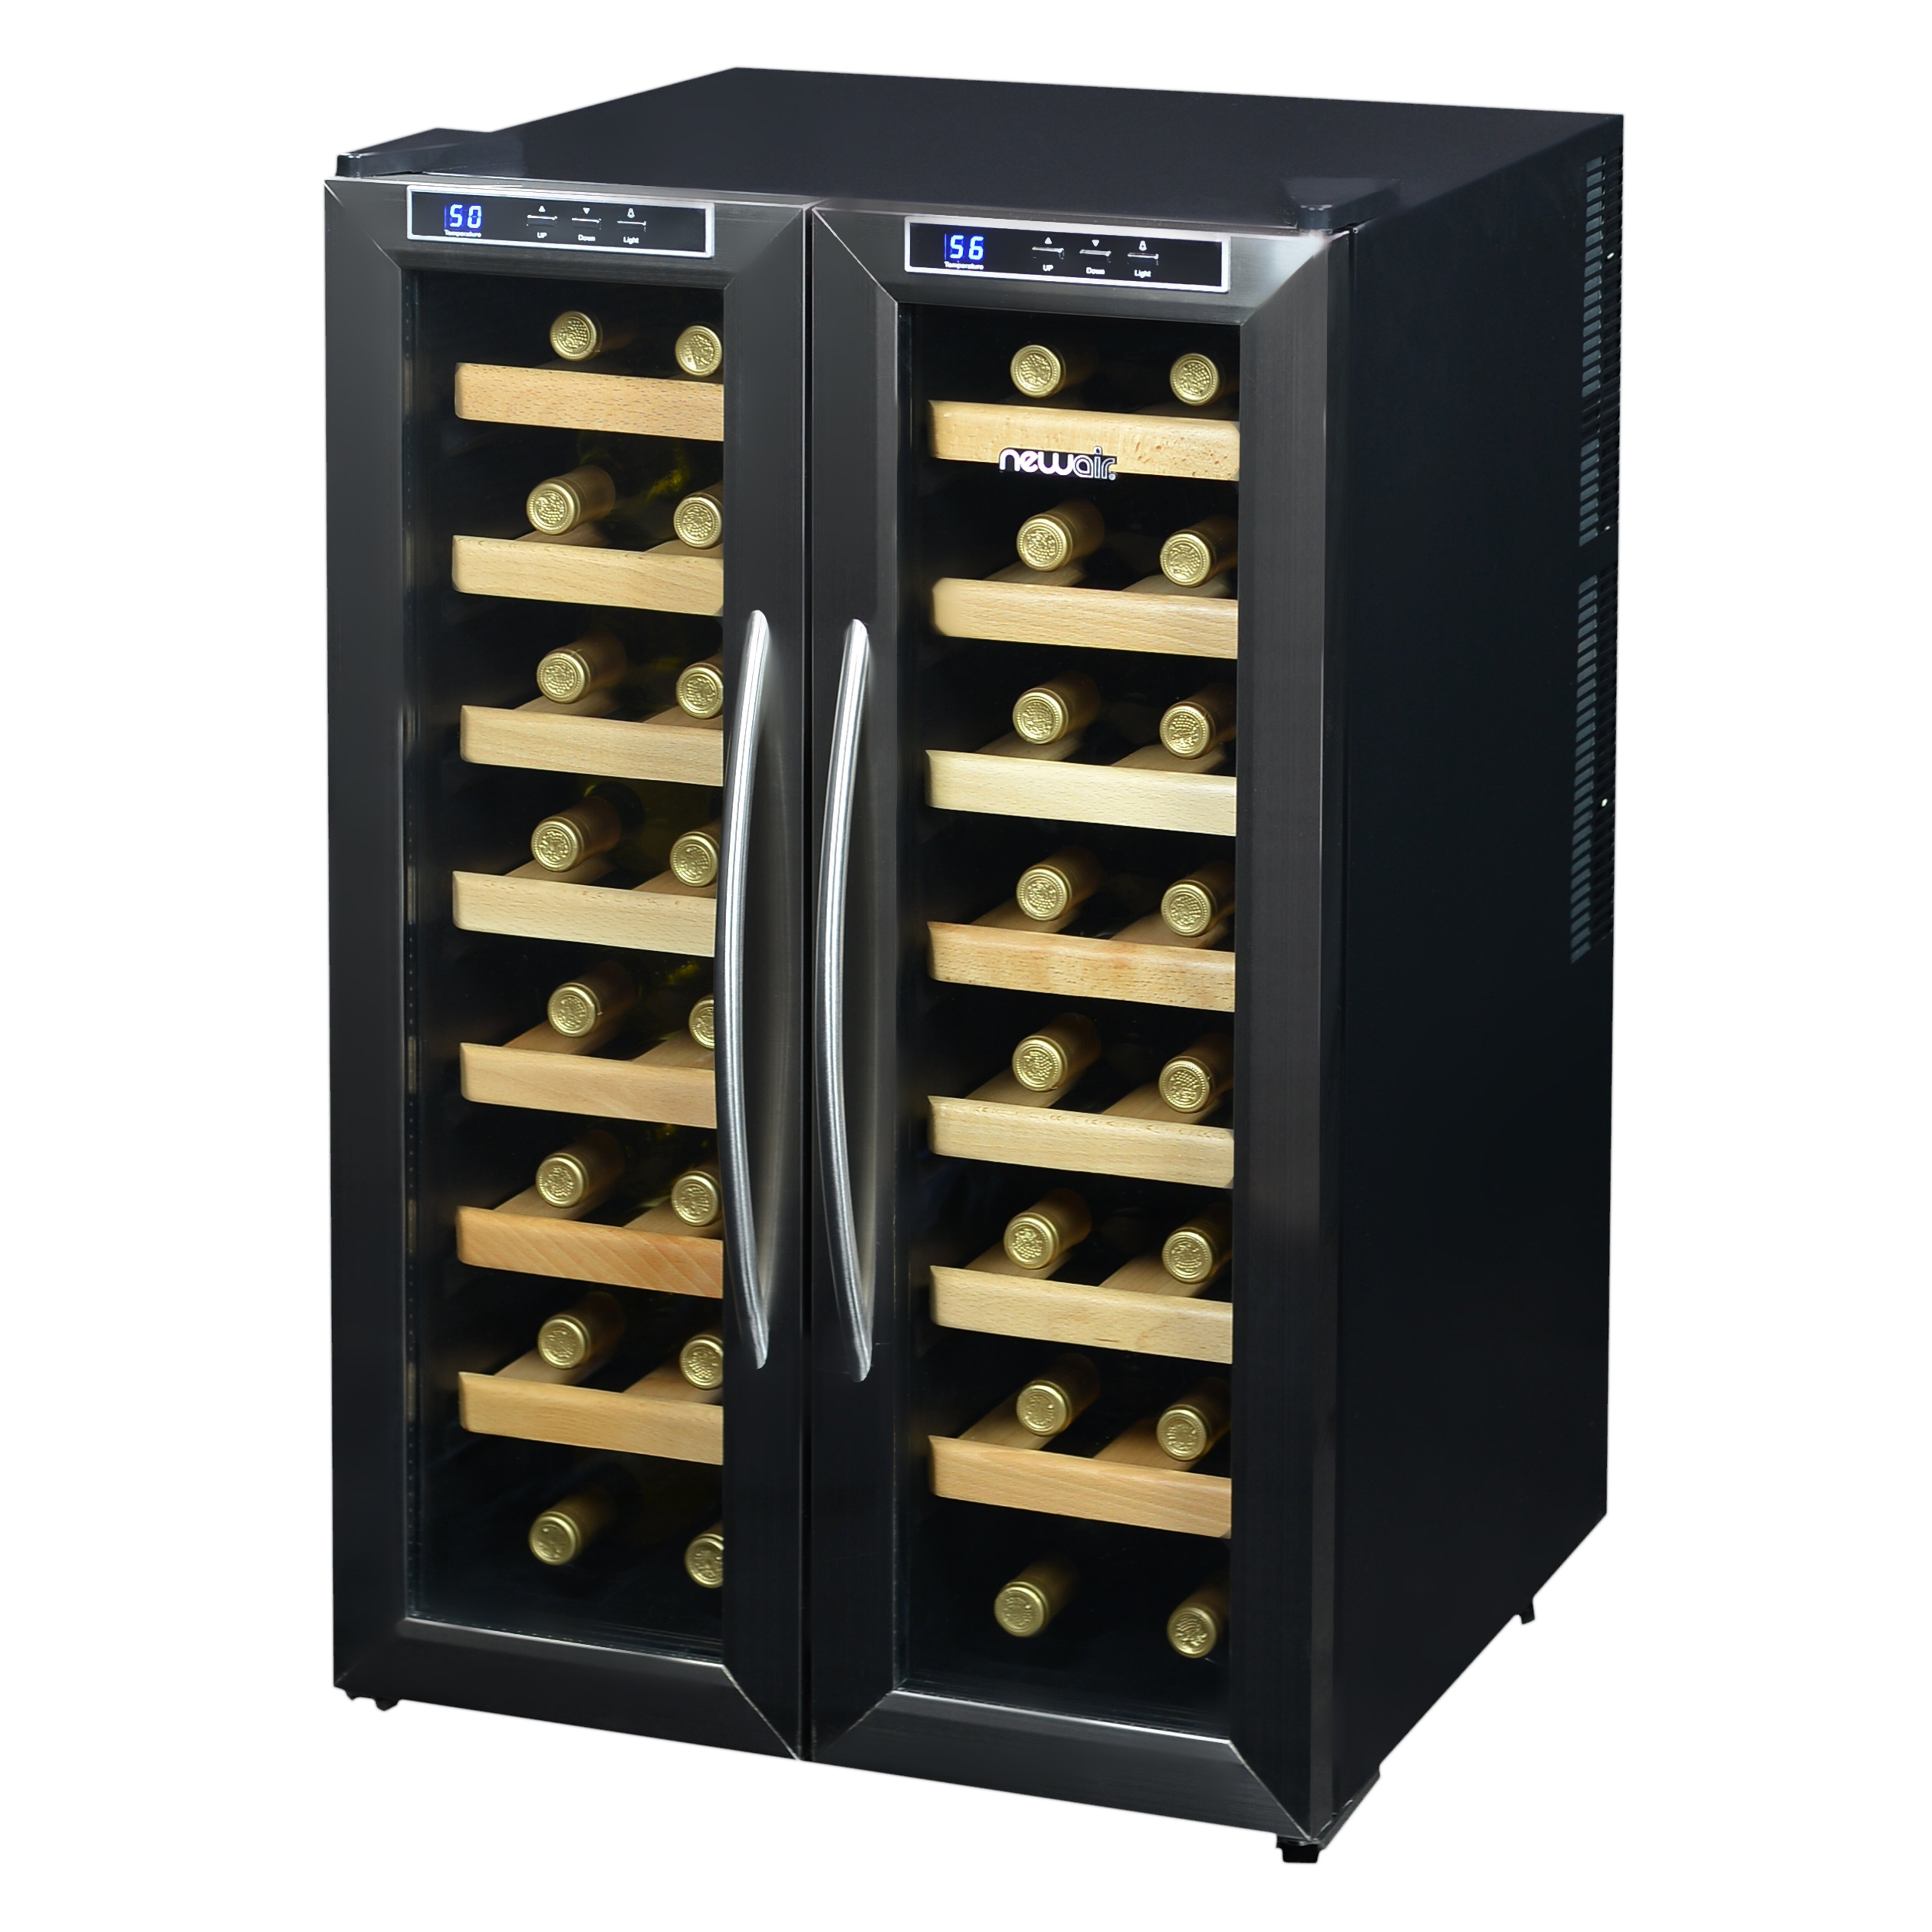 newair 32 bottle dual zone freestanding wine refrigerator reviews wayfair. Black Bedroom Furniture Sets. Home Design Ideas